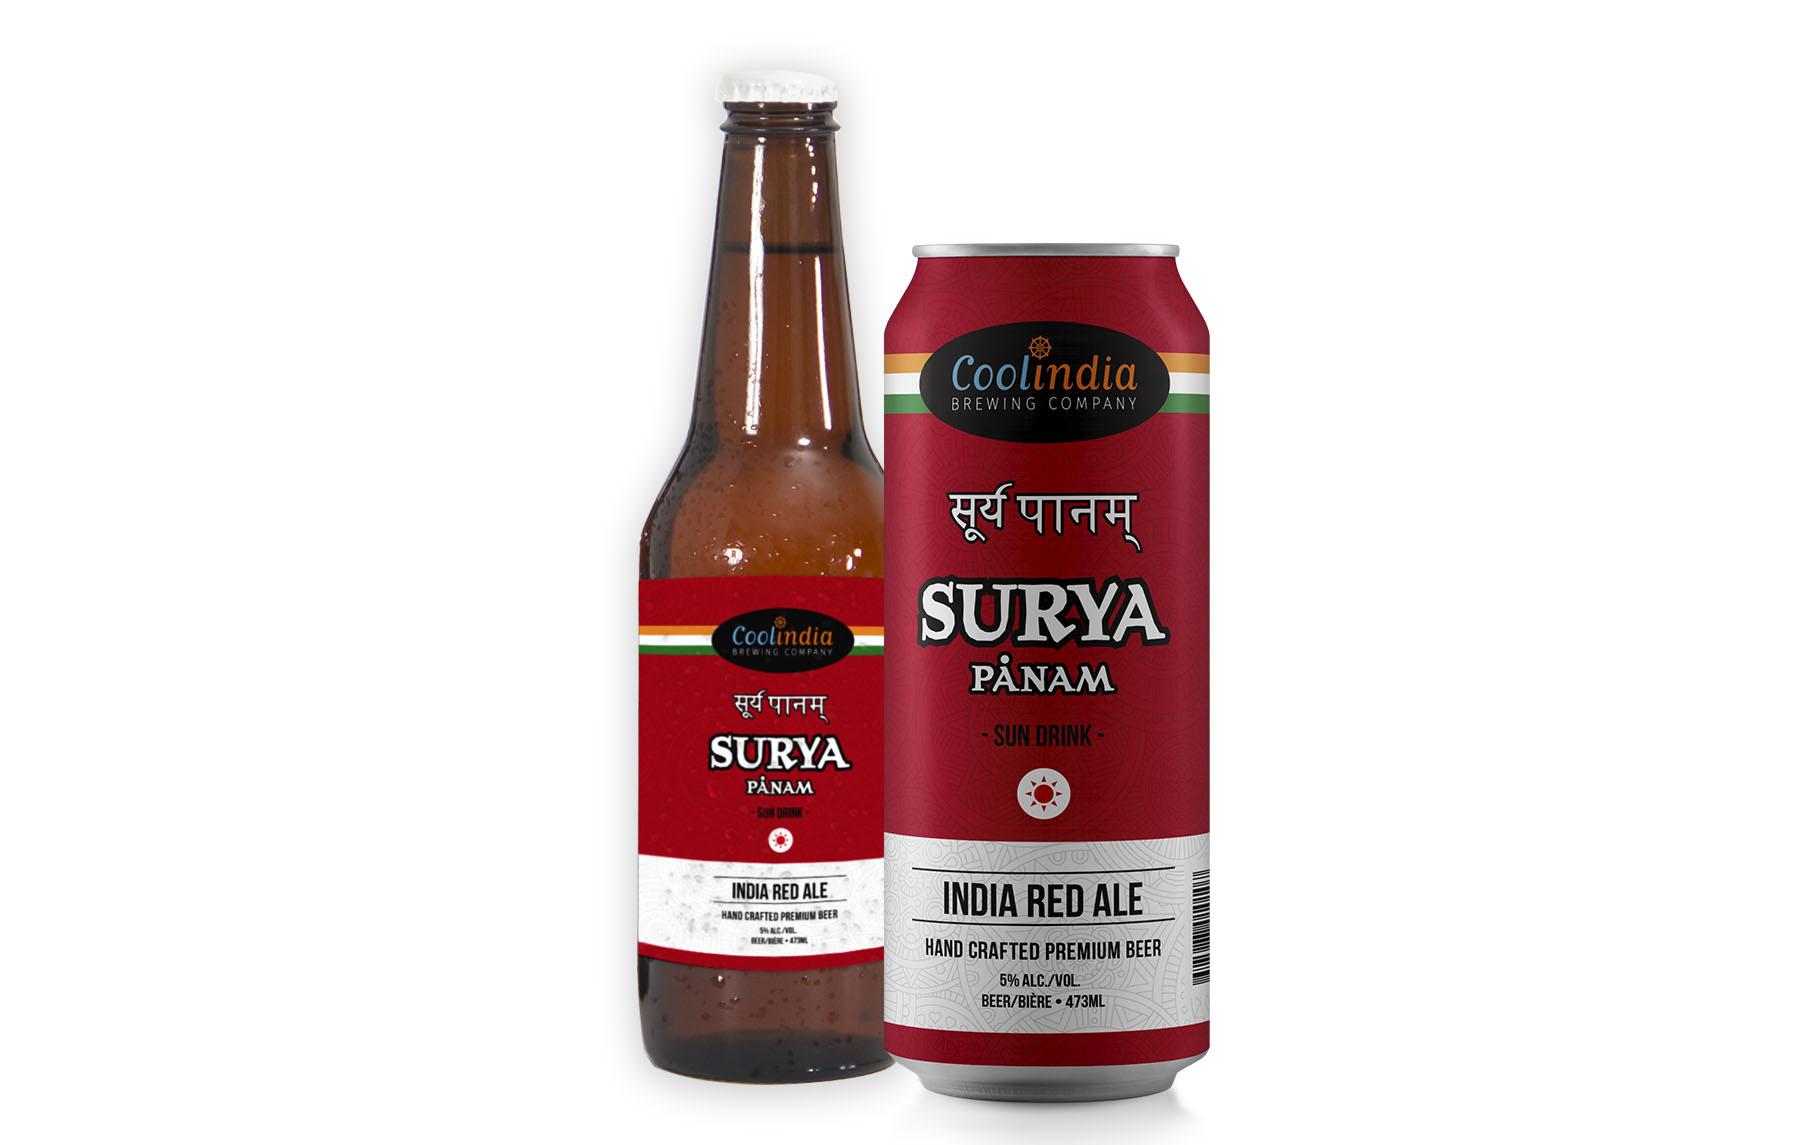 coolindia_bottles_mockup_surya